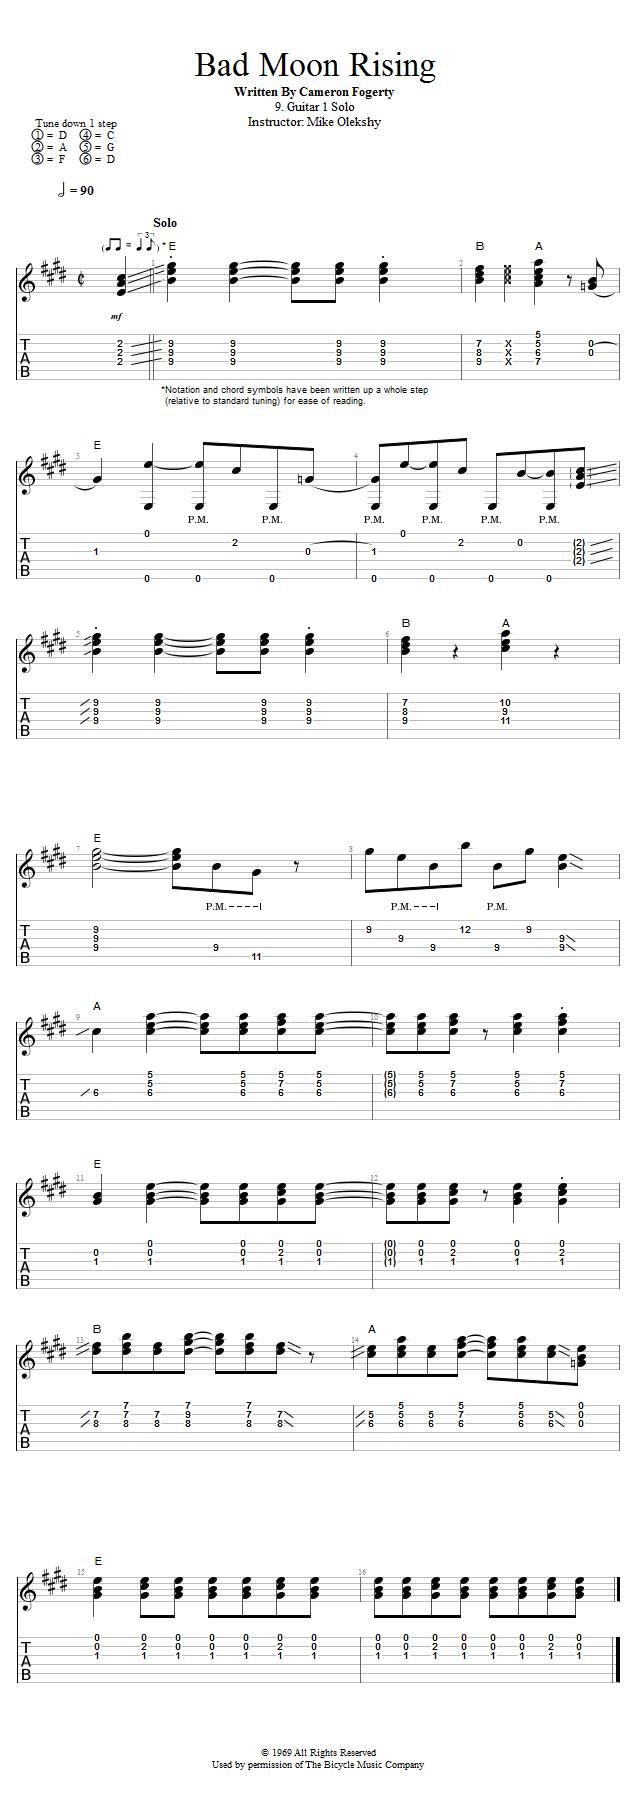 Guitar Lessons Guitar 1 Solo